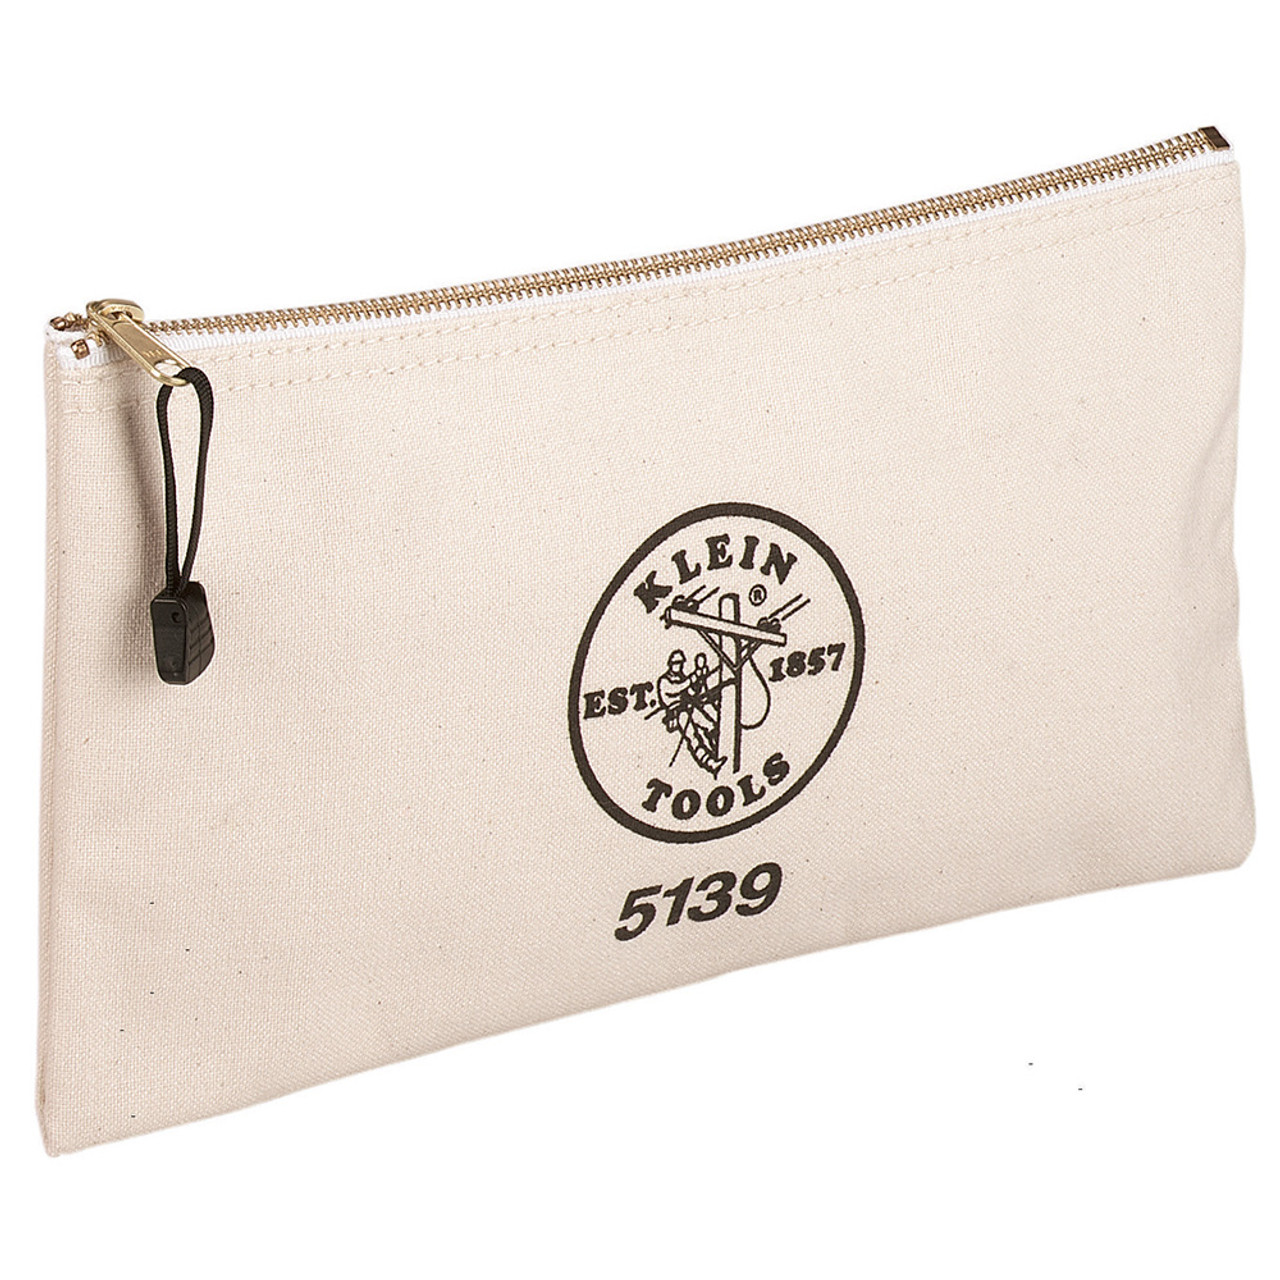 Klein 5139 Canvas Zipper Bag